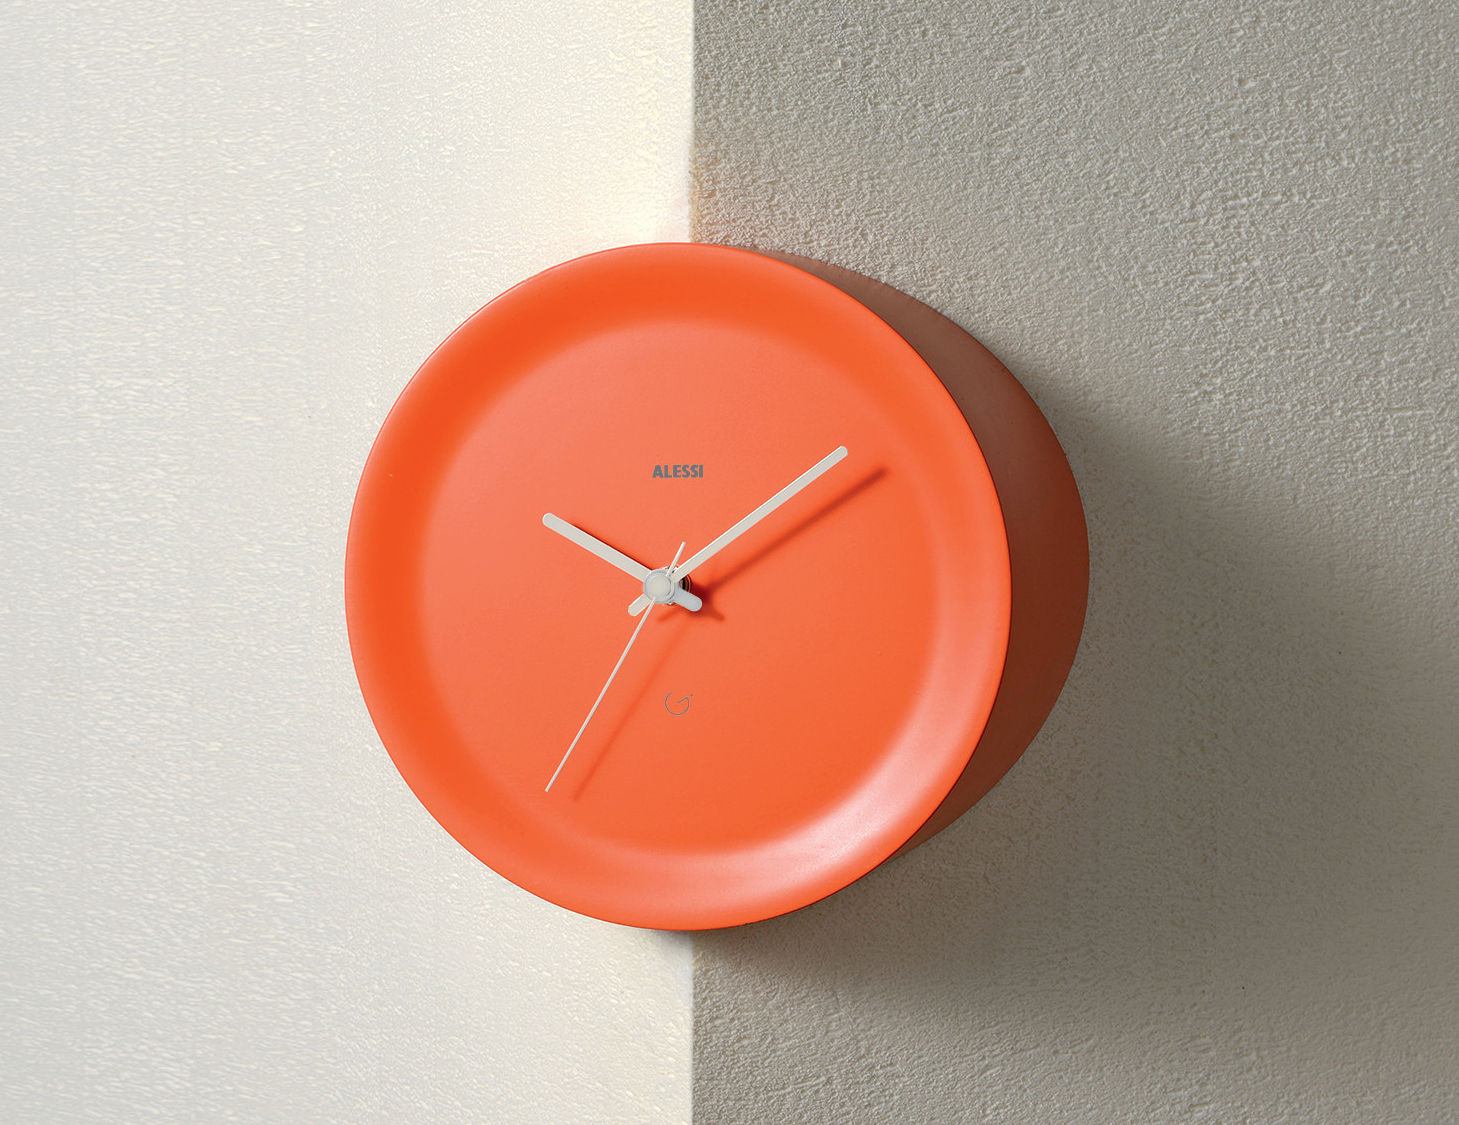 Interni - Orologi  - Orologio a parete Ora Out su spigolo a parete / Ø 21 x H 15 cm - Alessi - Orange / Lancette grigie - Resina termoplastica